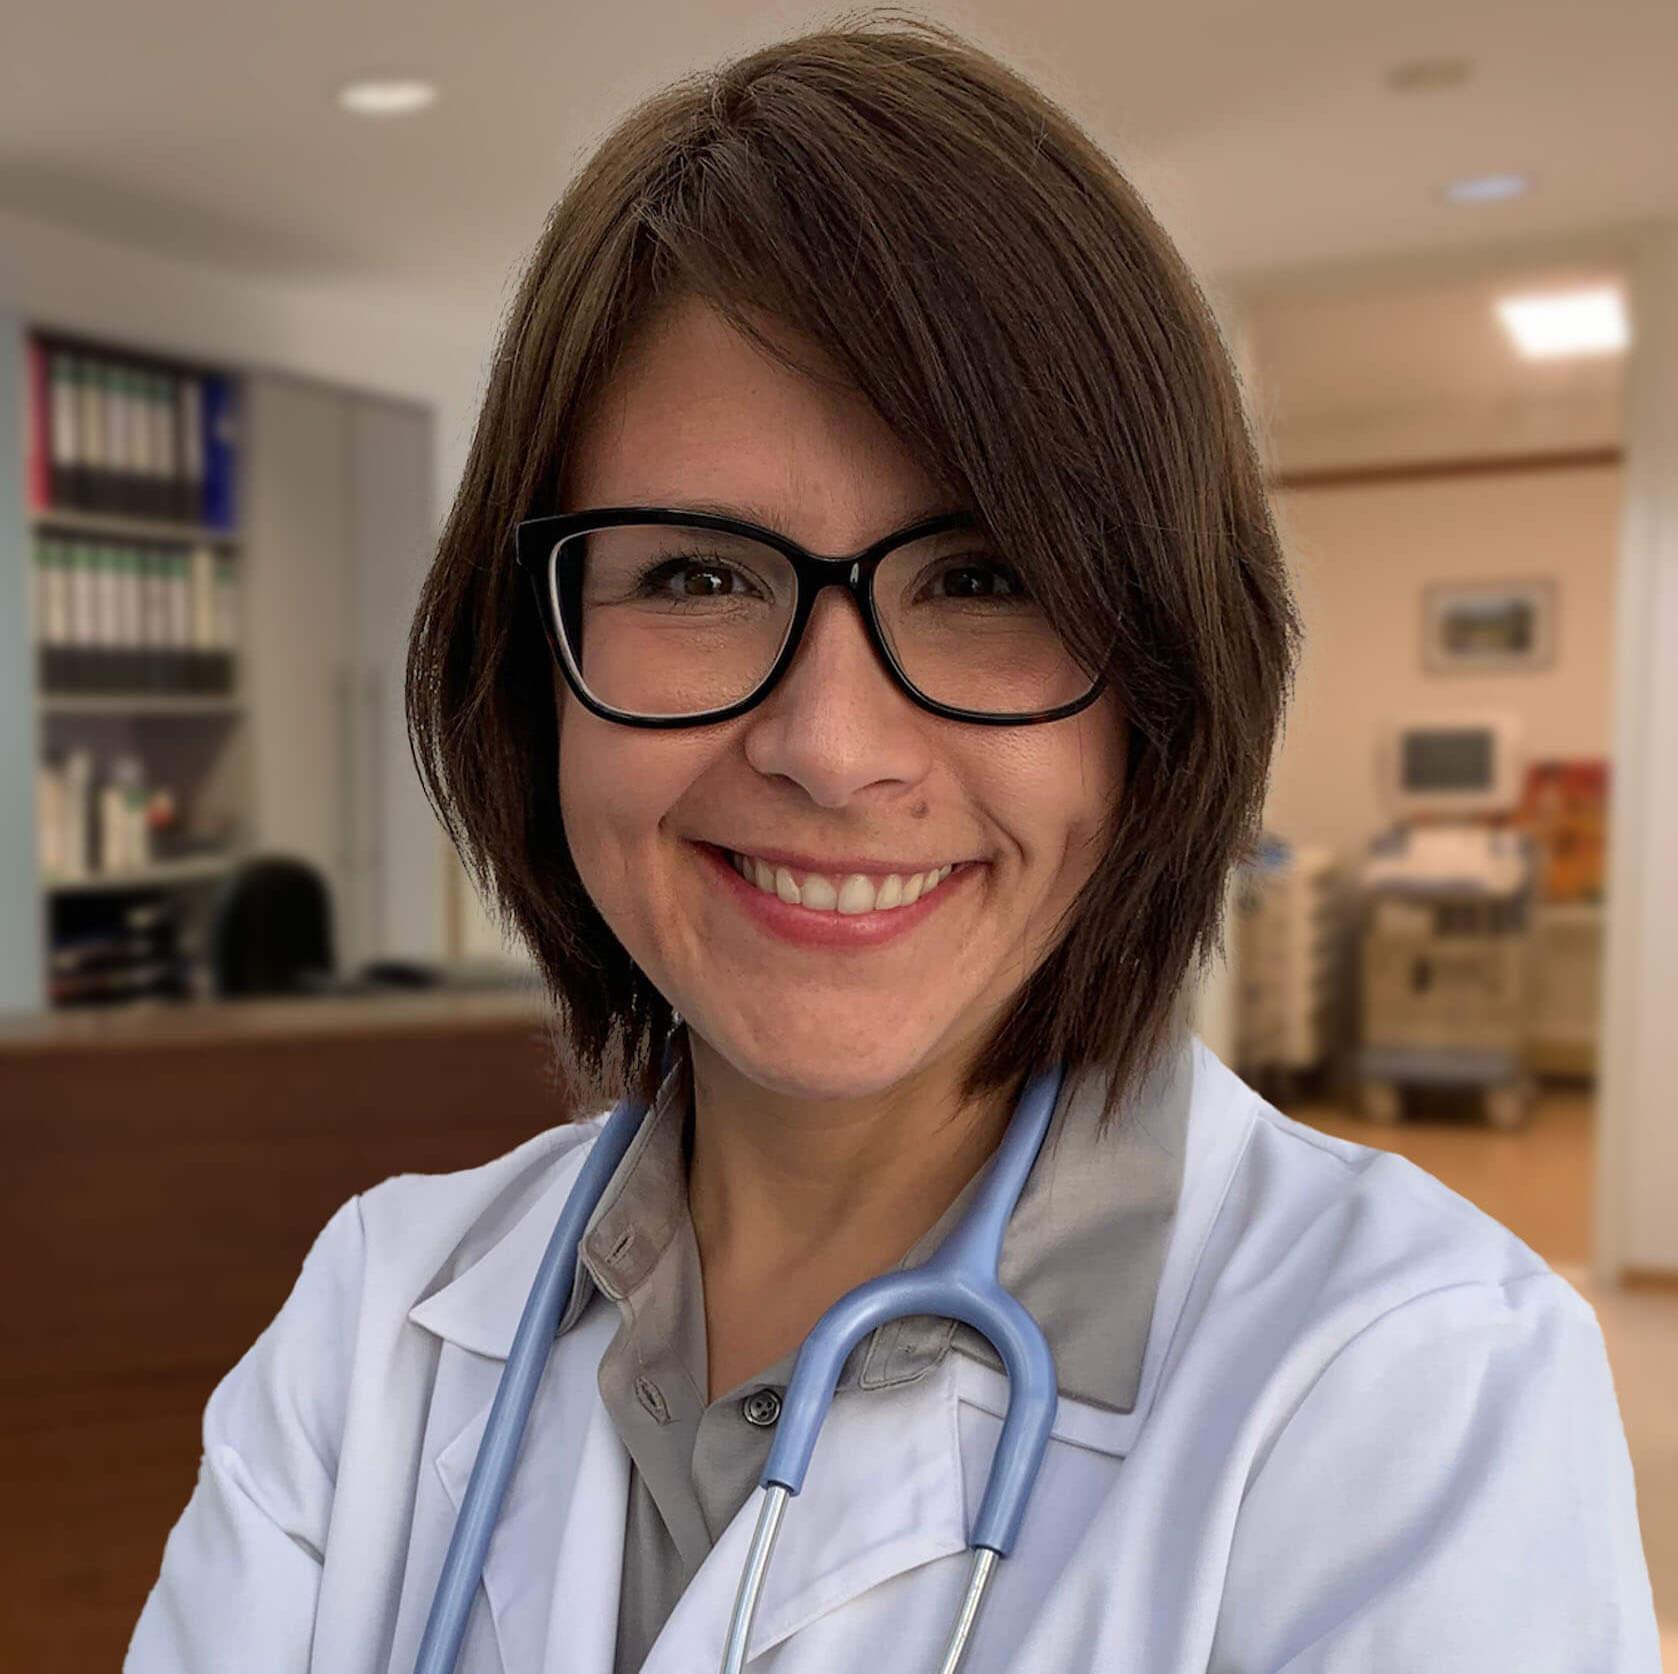 Hausarzt Stuttgart-Ost